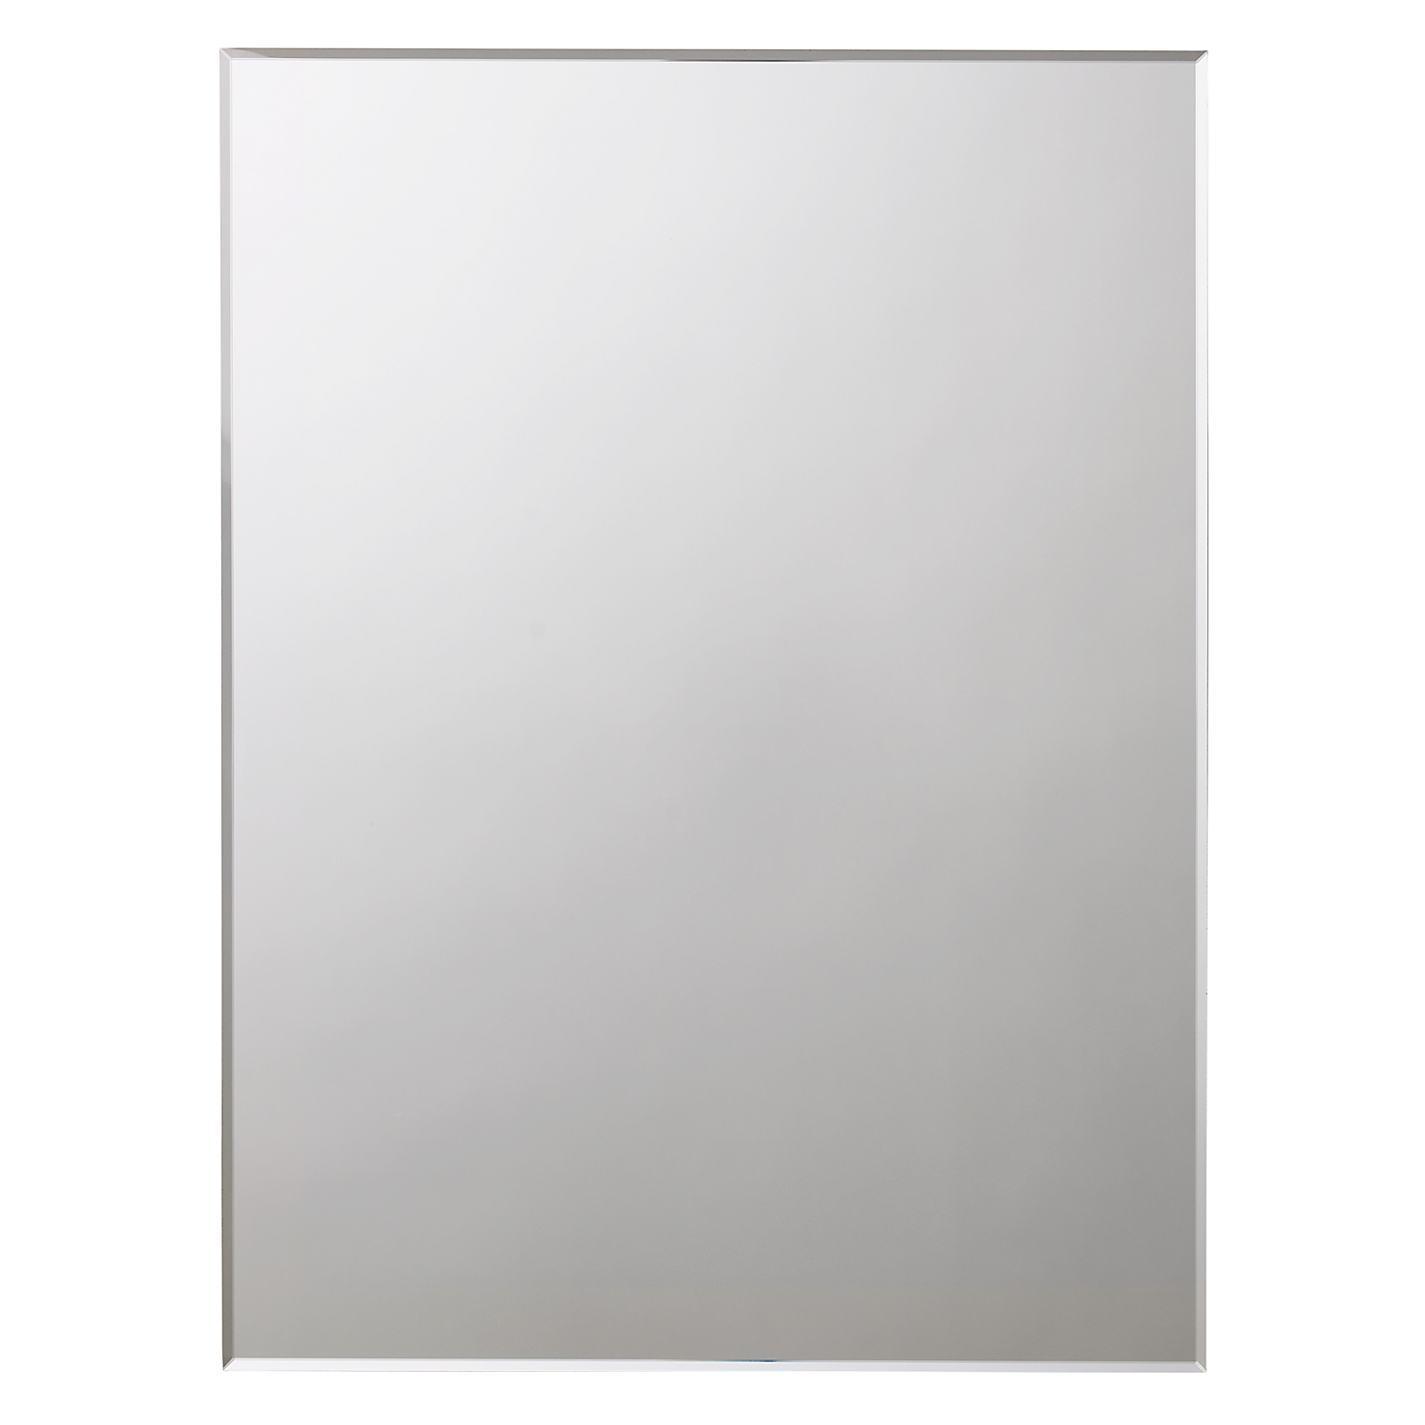 Bevelled Edge Bathroom Mirror – Harpsounds (View 6 of 20)